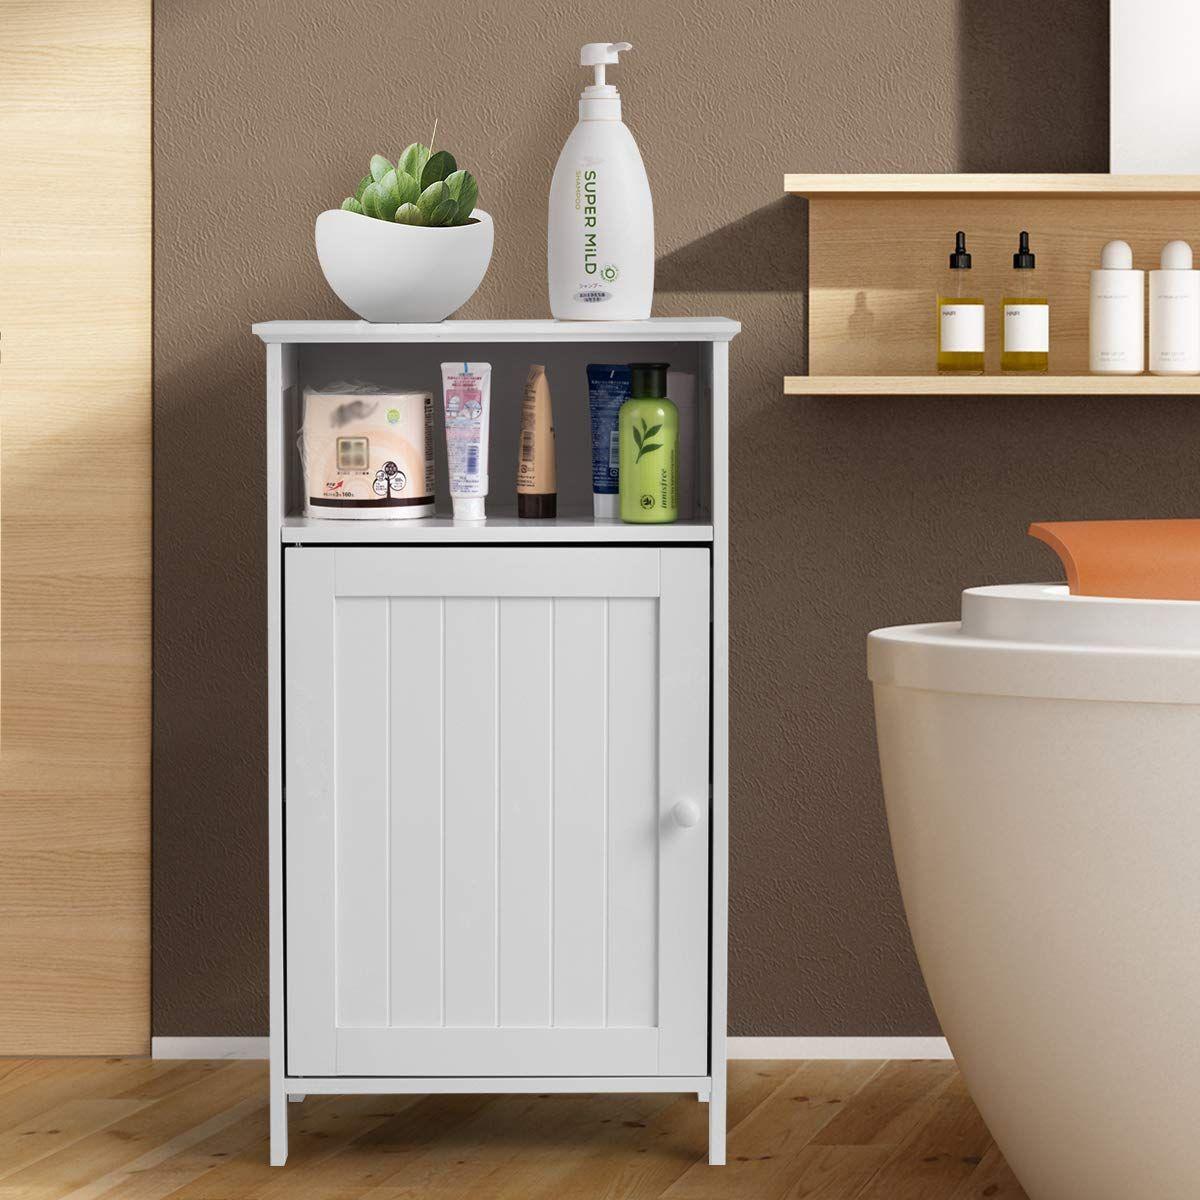 26+ Super deal modern bathroom floor storage cabinet model